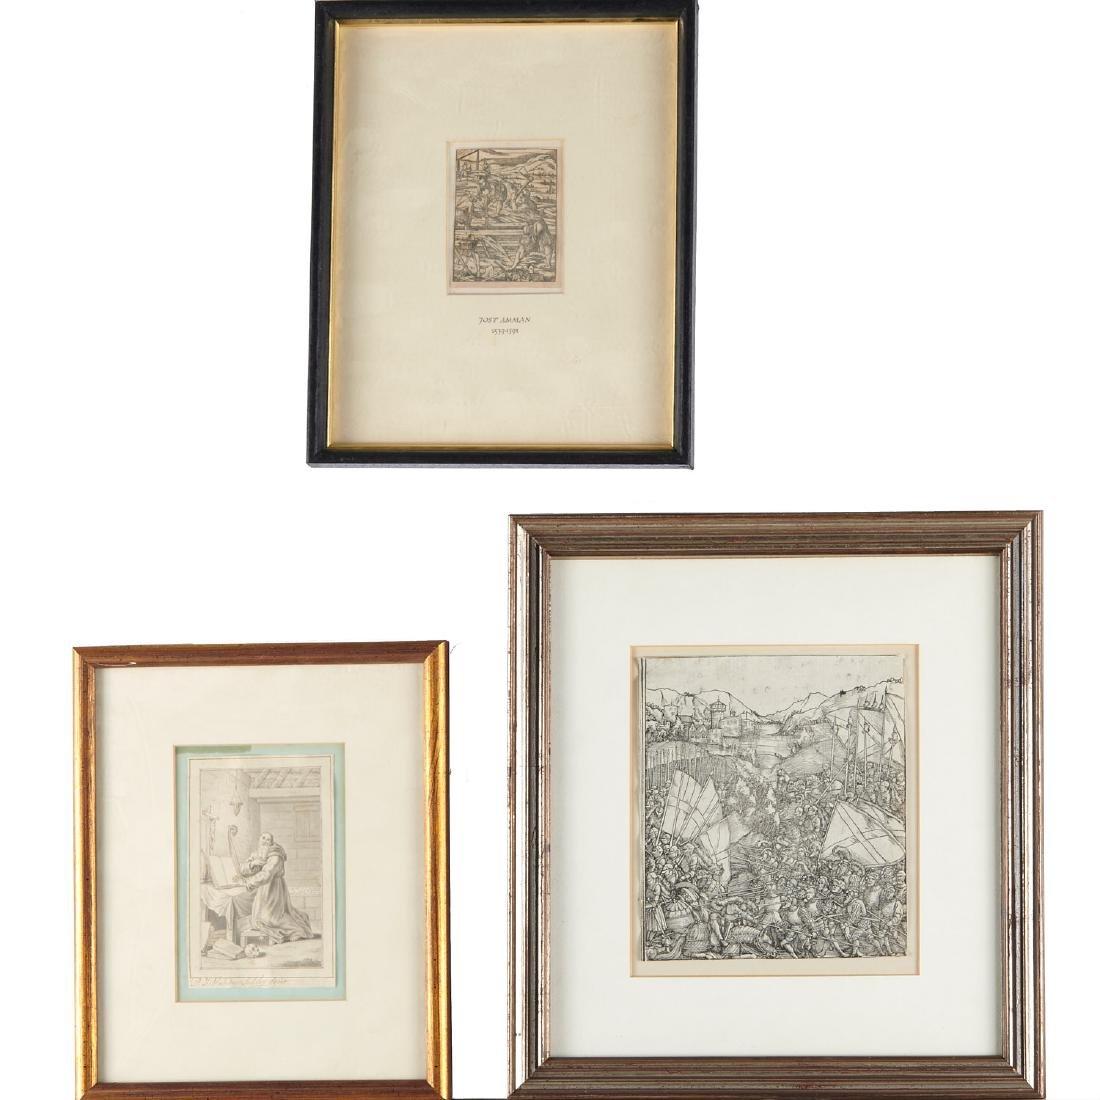 (3) Old Master woodcut engravings